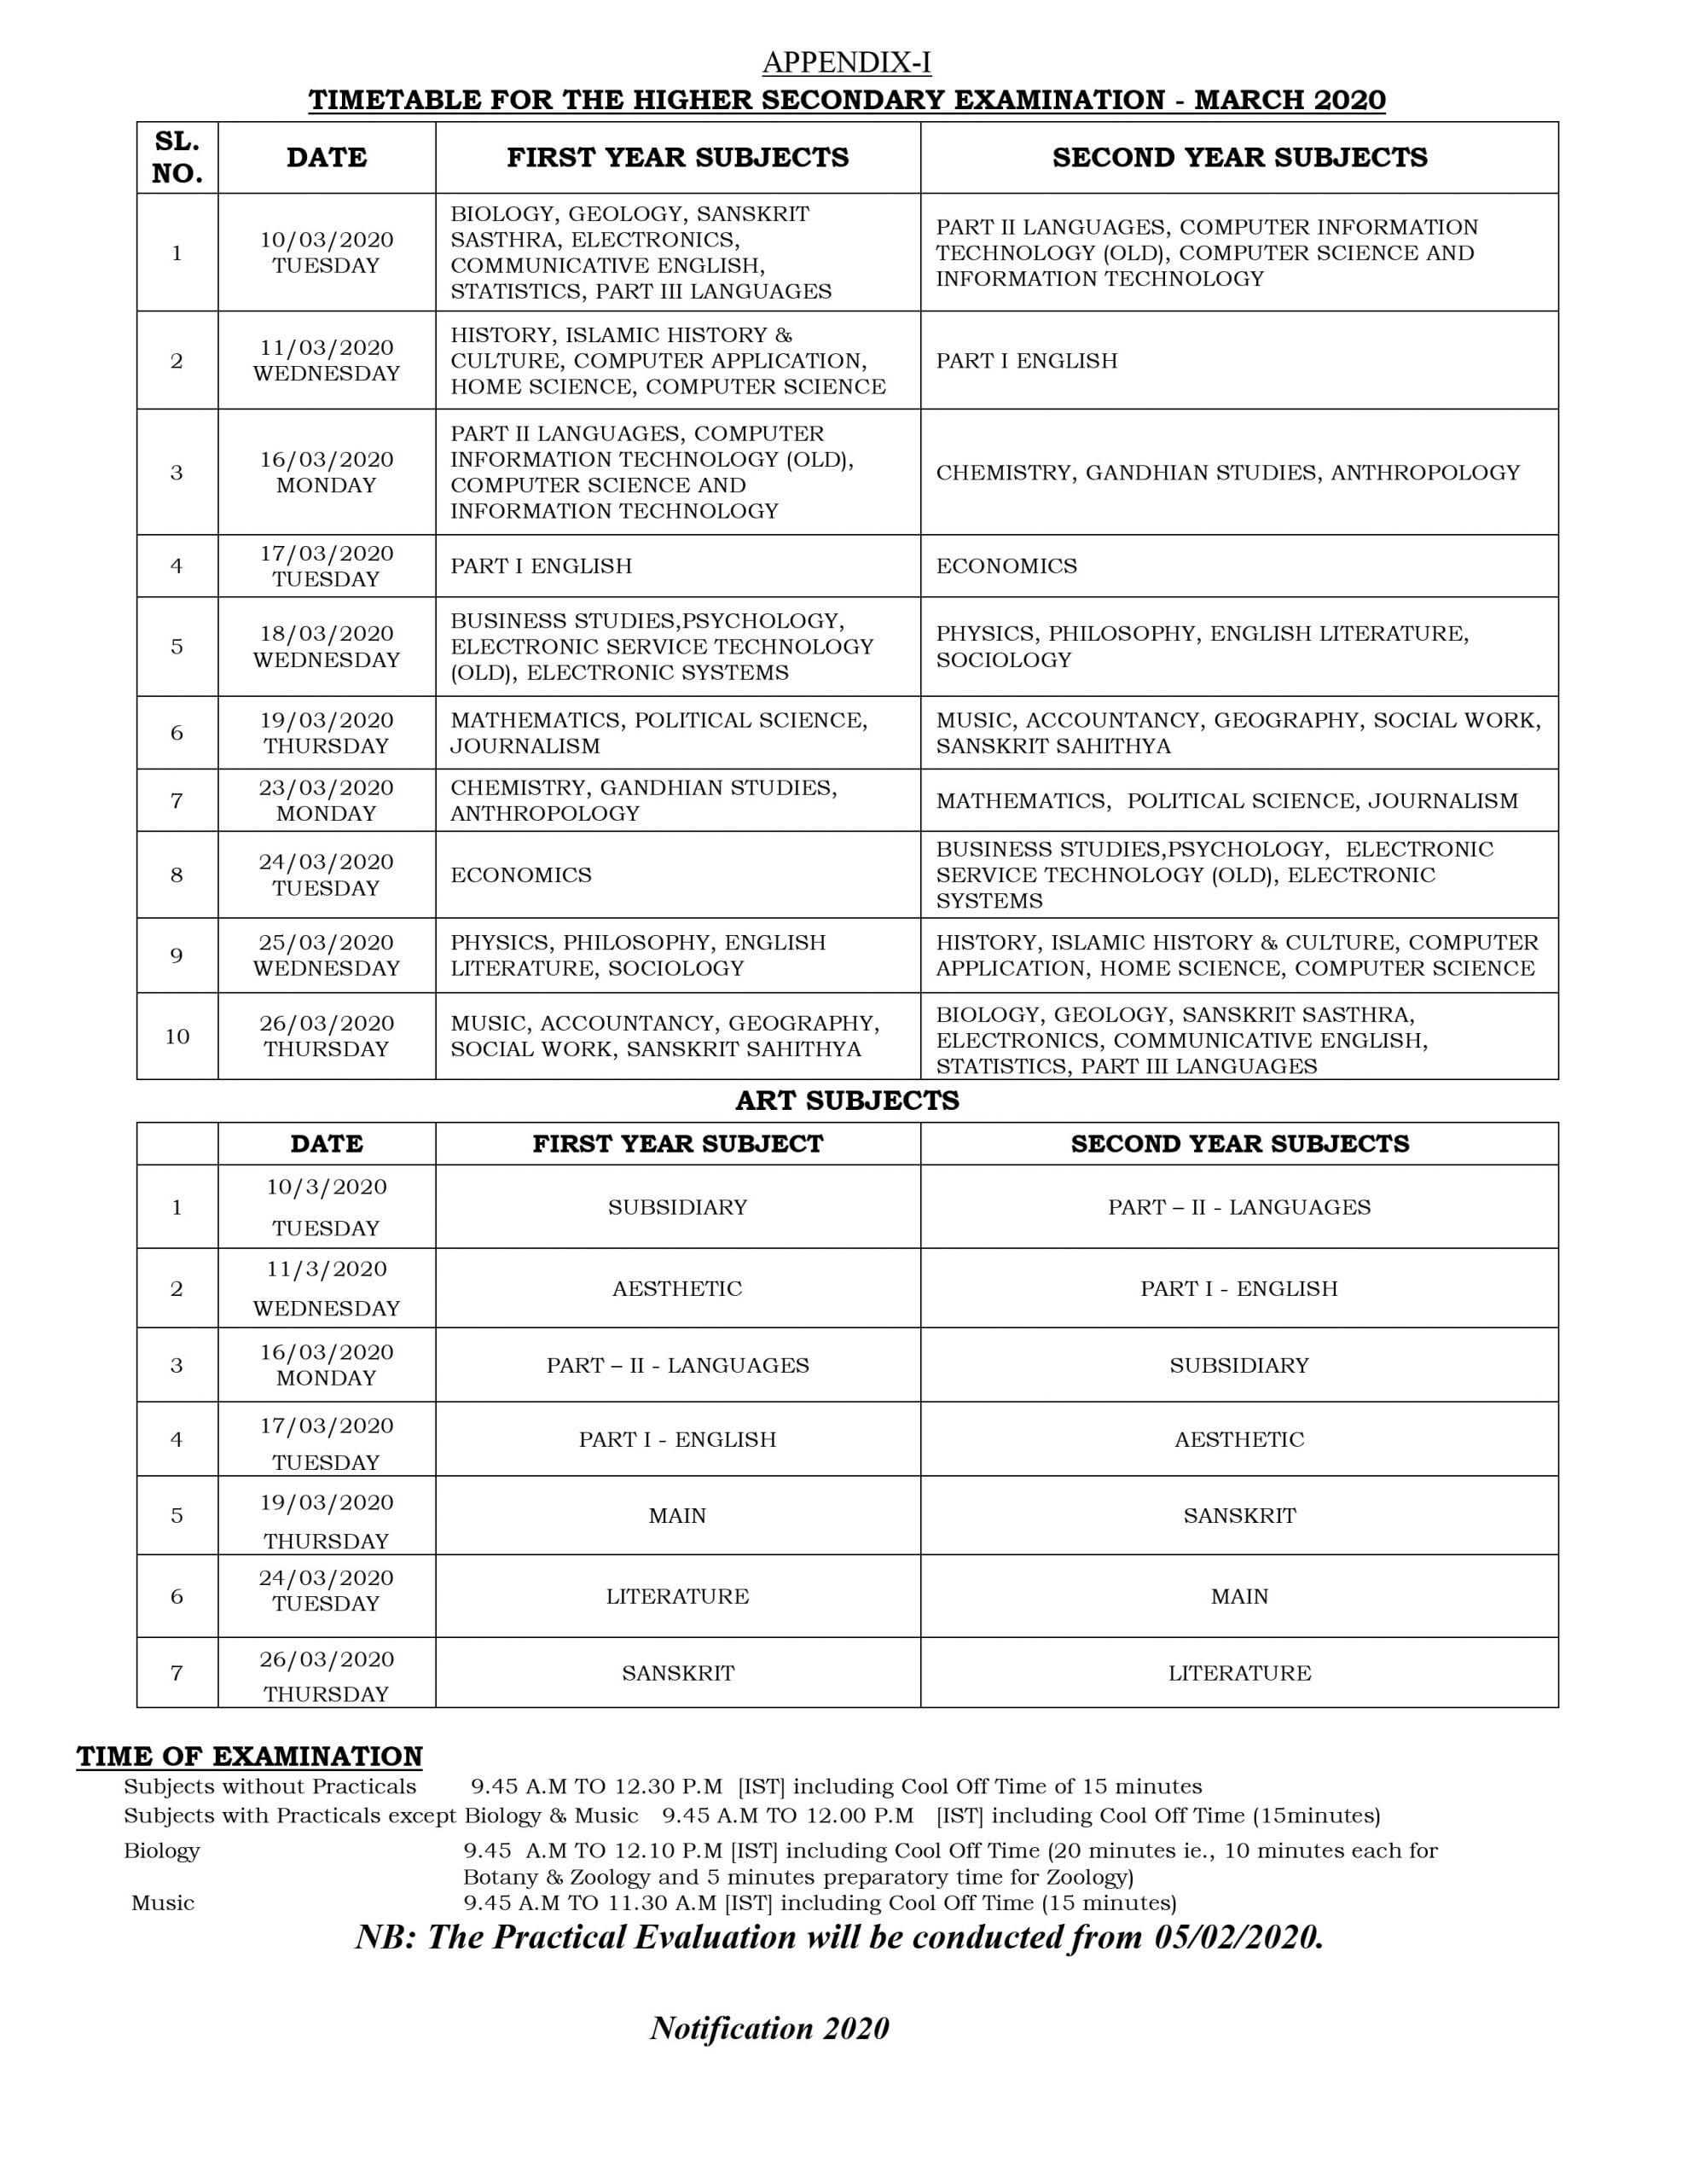 Kerala Plus Two Exam 2020 Time Table